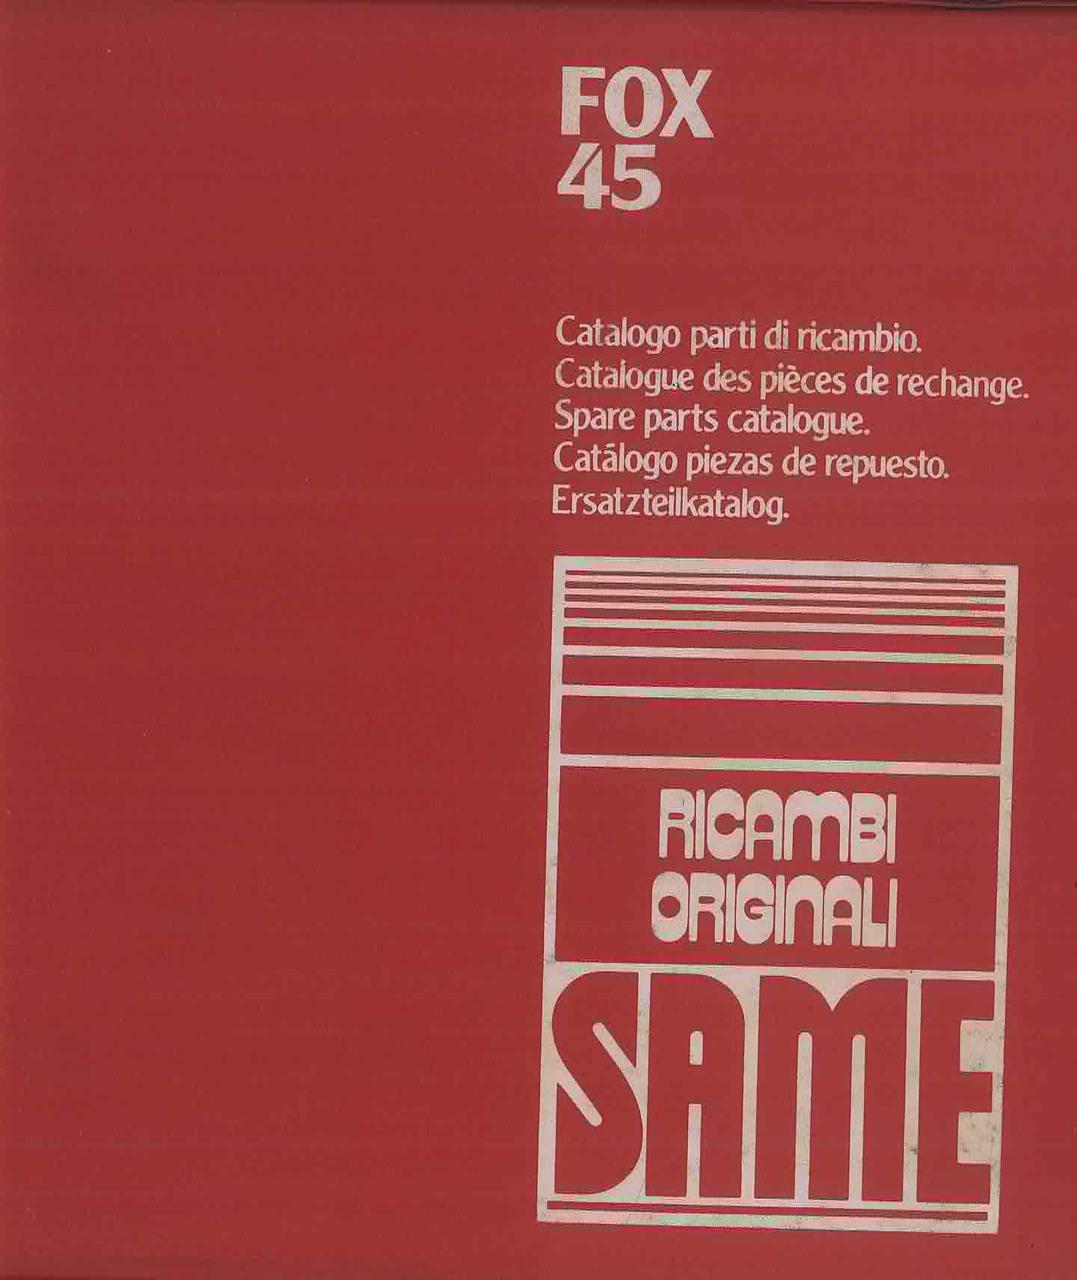 FOX 45 - Catalogo Parti di Ricambio / Catalogue de pièces de rechange / Spare parts catalogue / Ersatzteilliste / Lista de repuestos